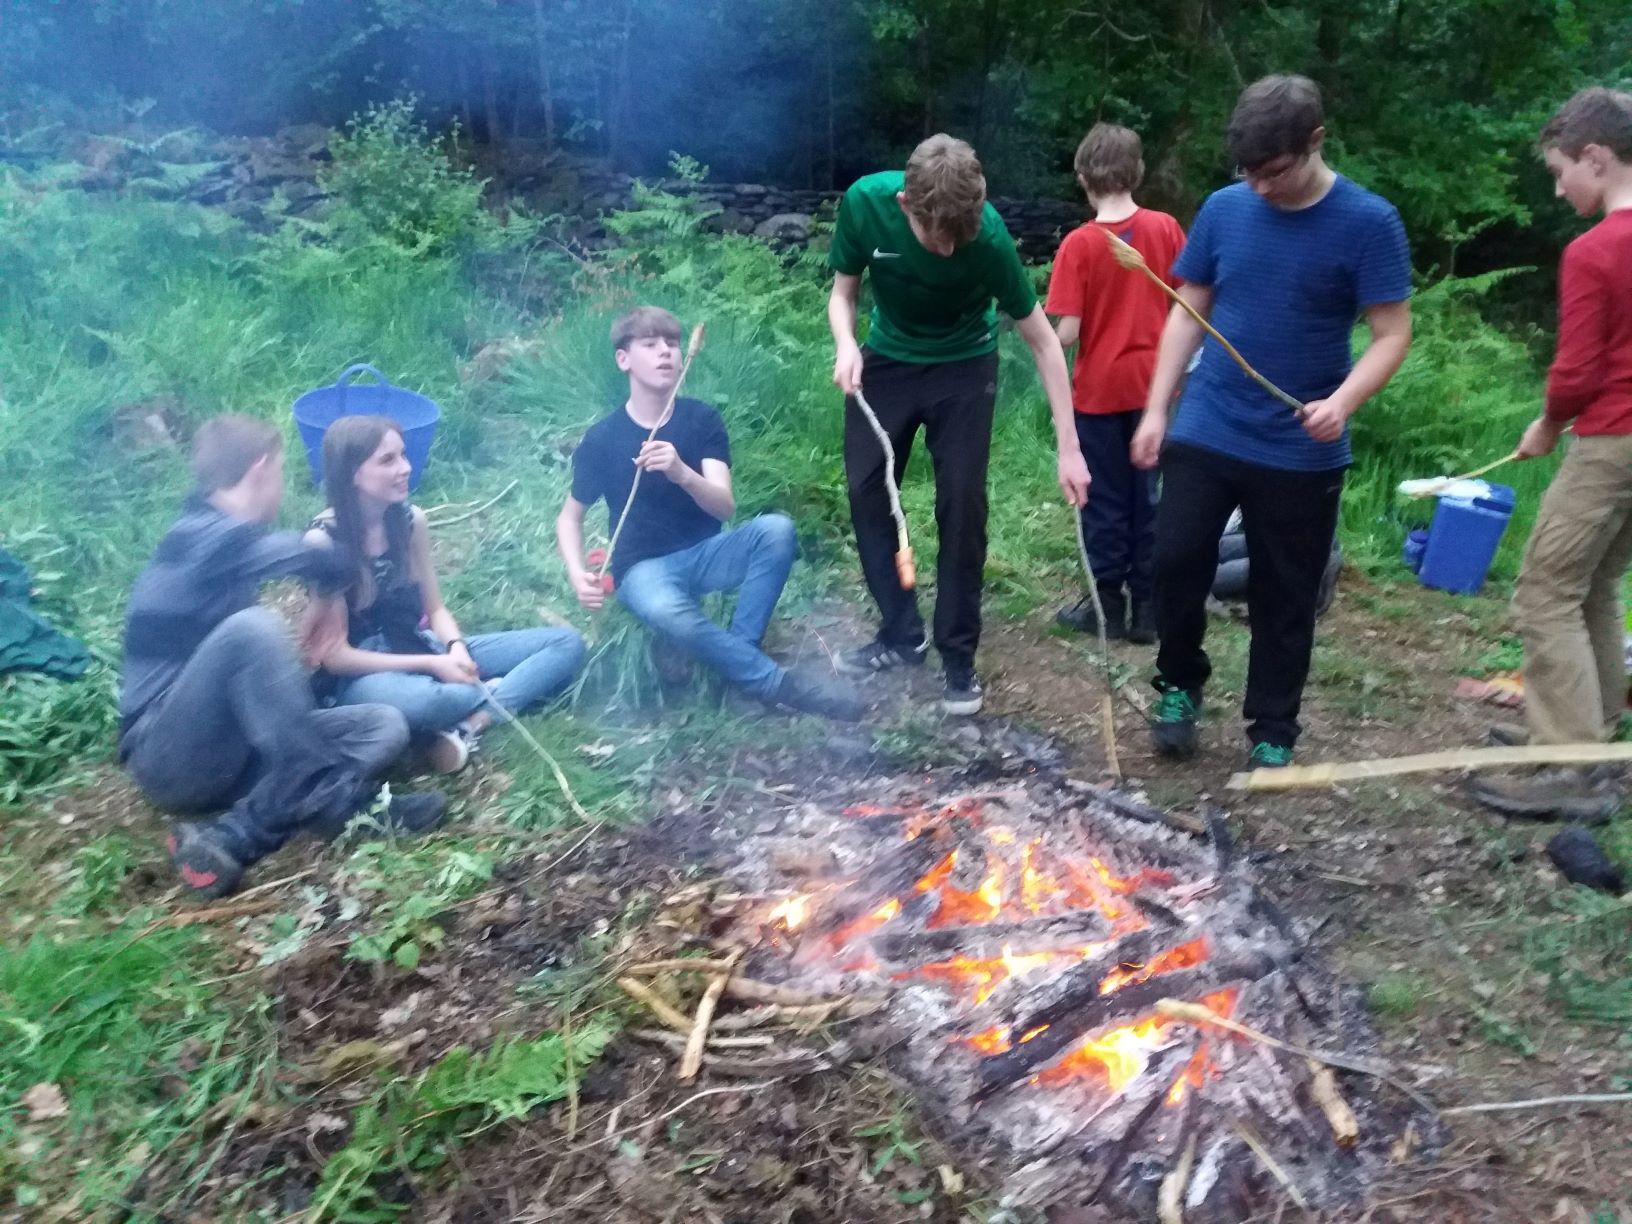 Ceidwaid Ifanc yn coginio dros dân / Young Rangers cooking on a fire